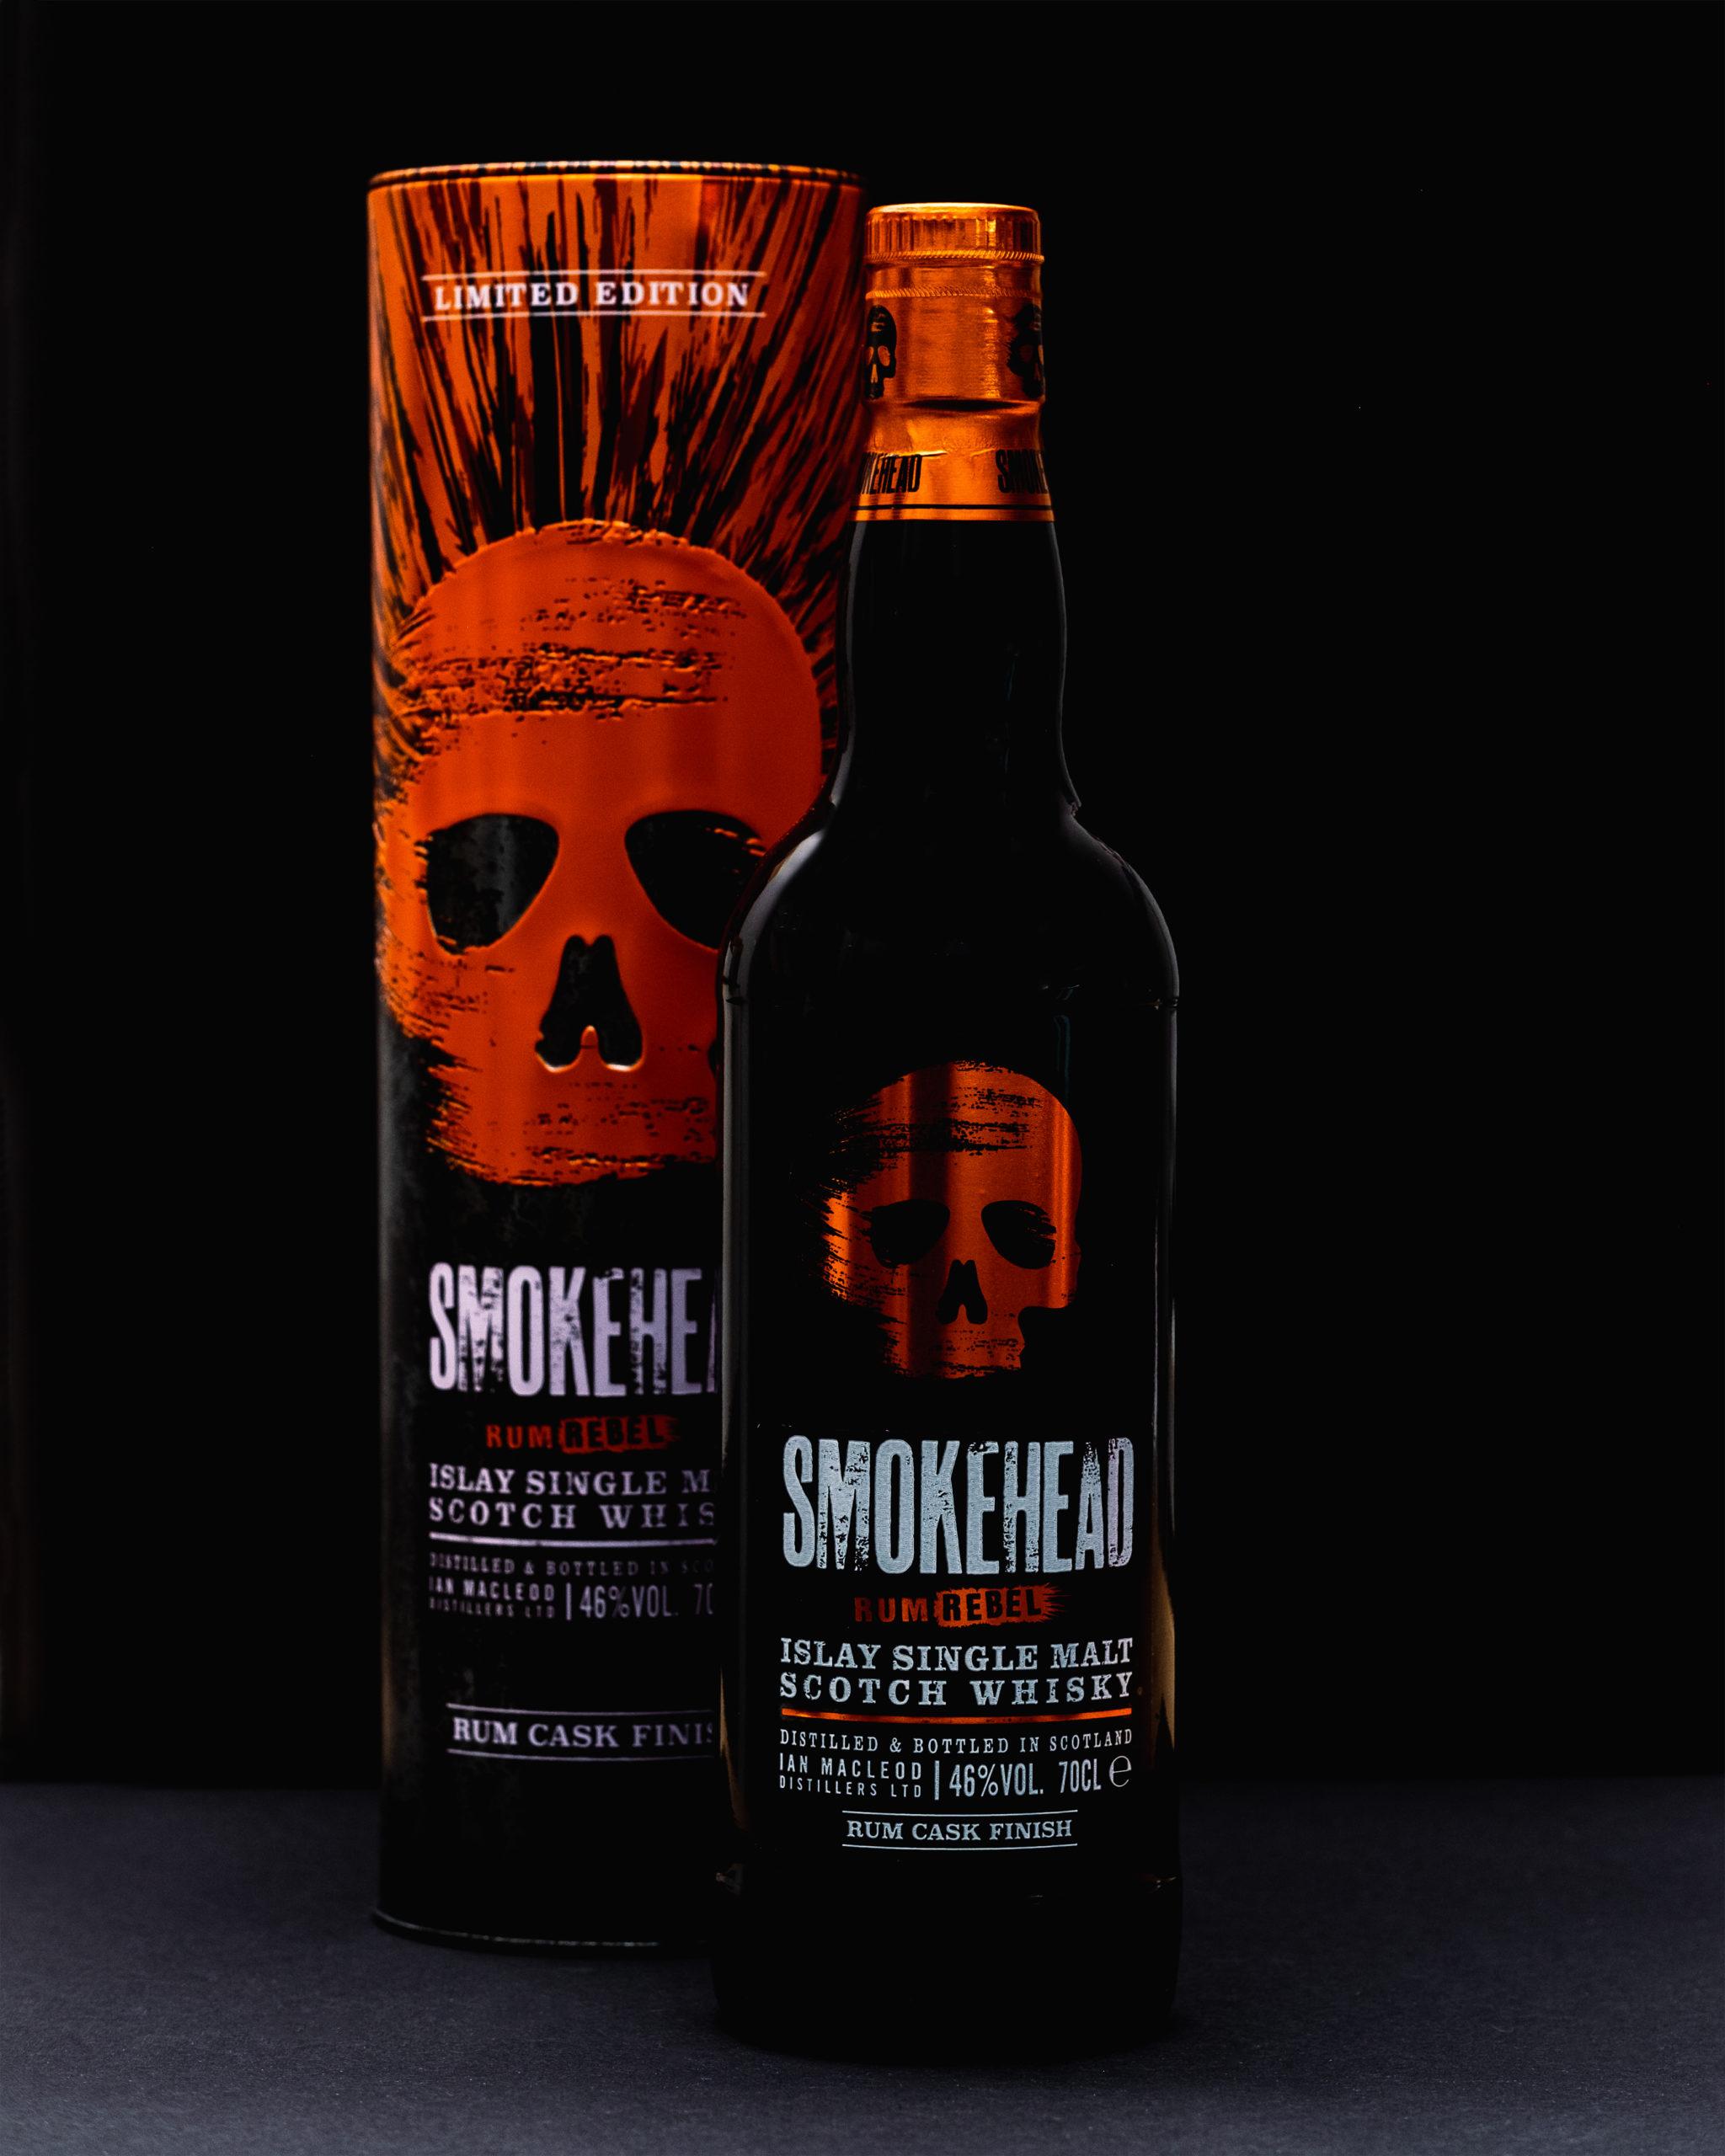 Smokehead Rhum Rebel Scotch Whisky